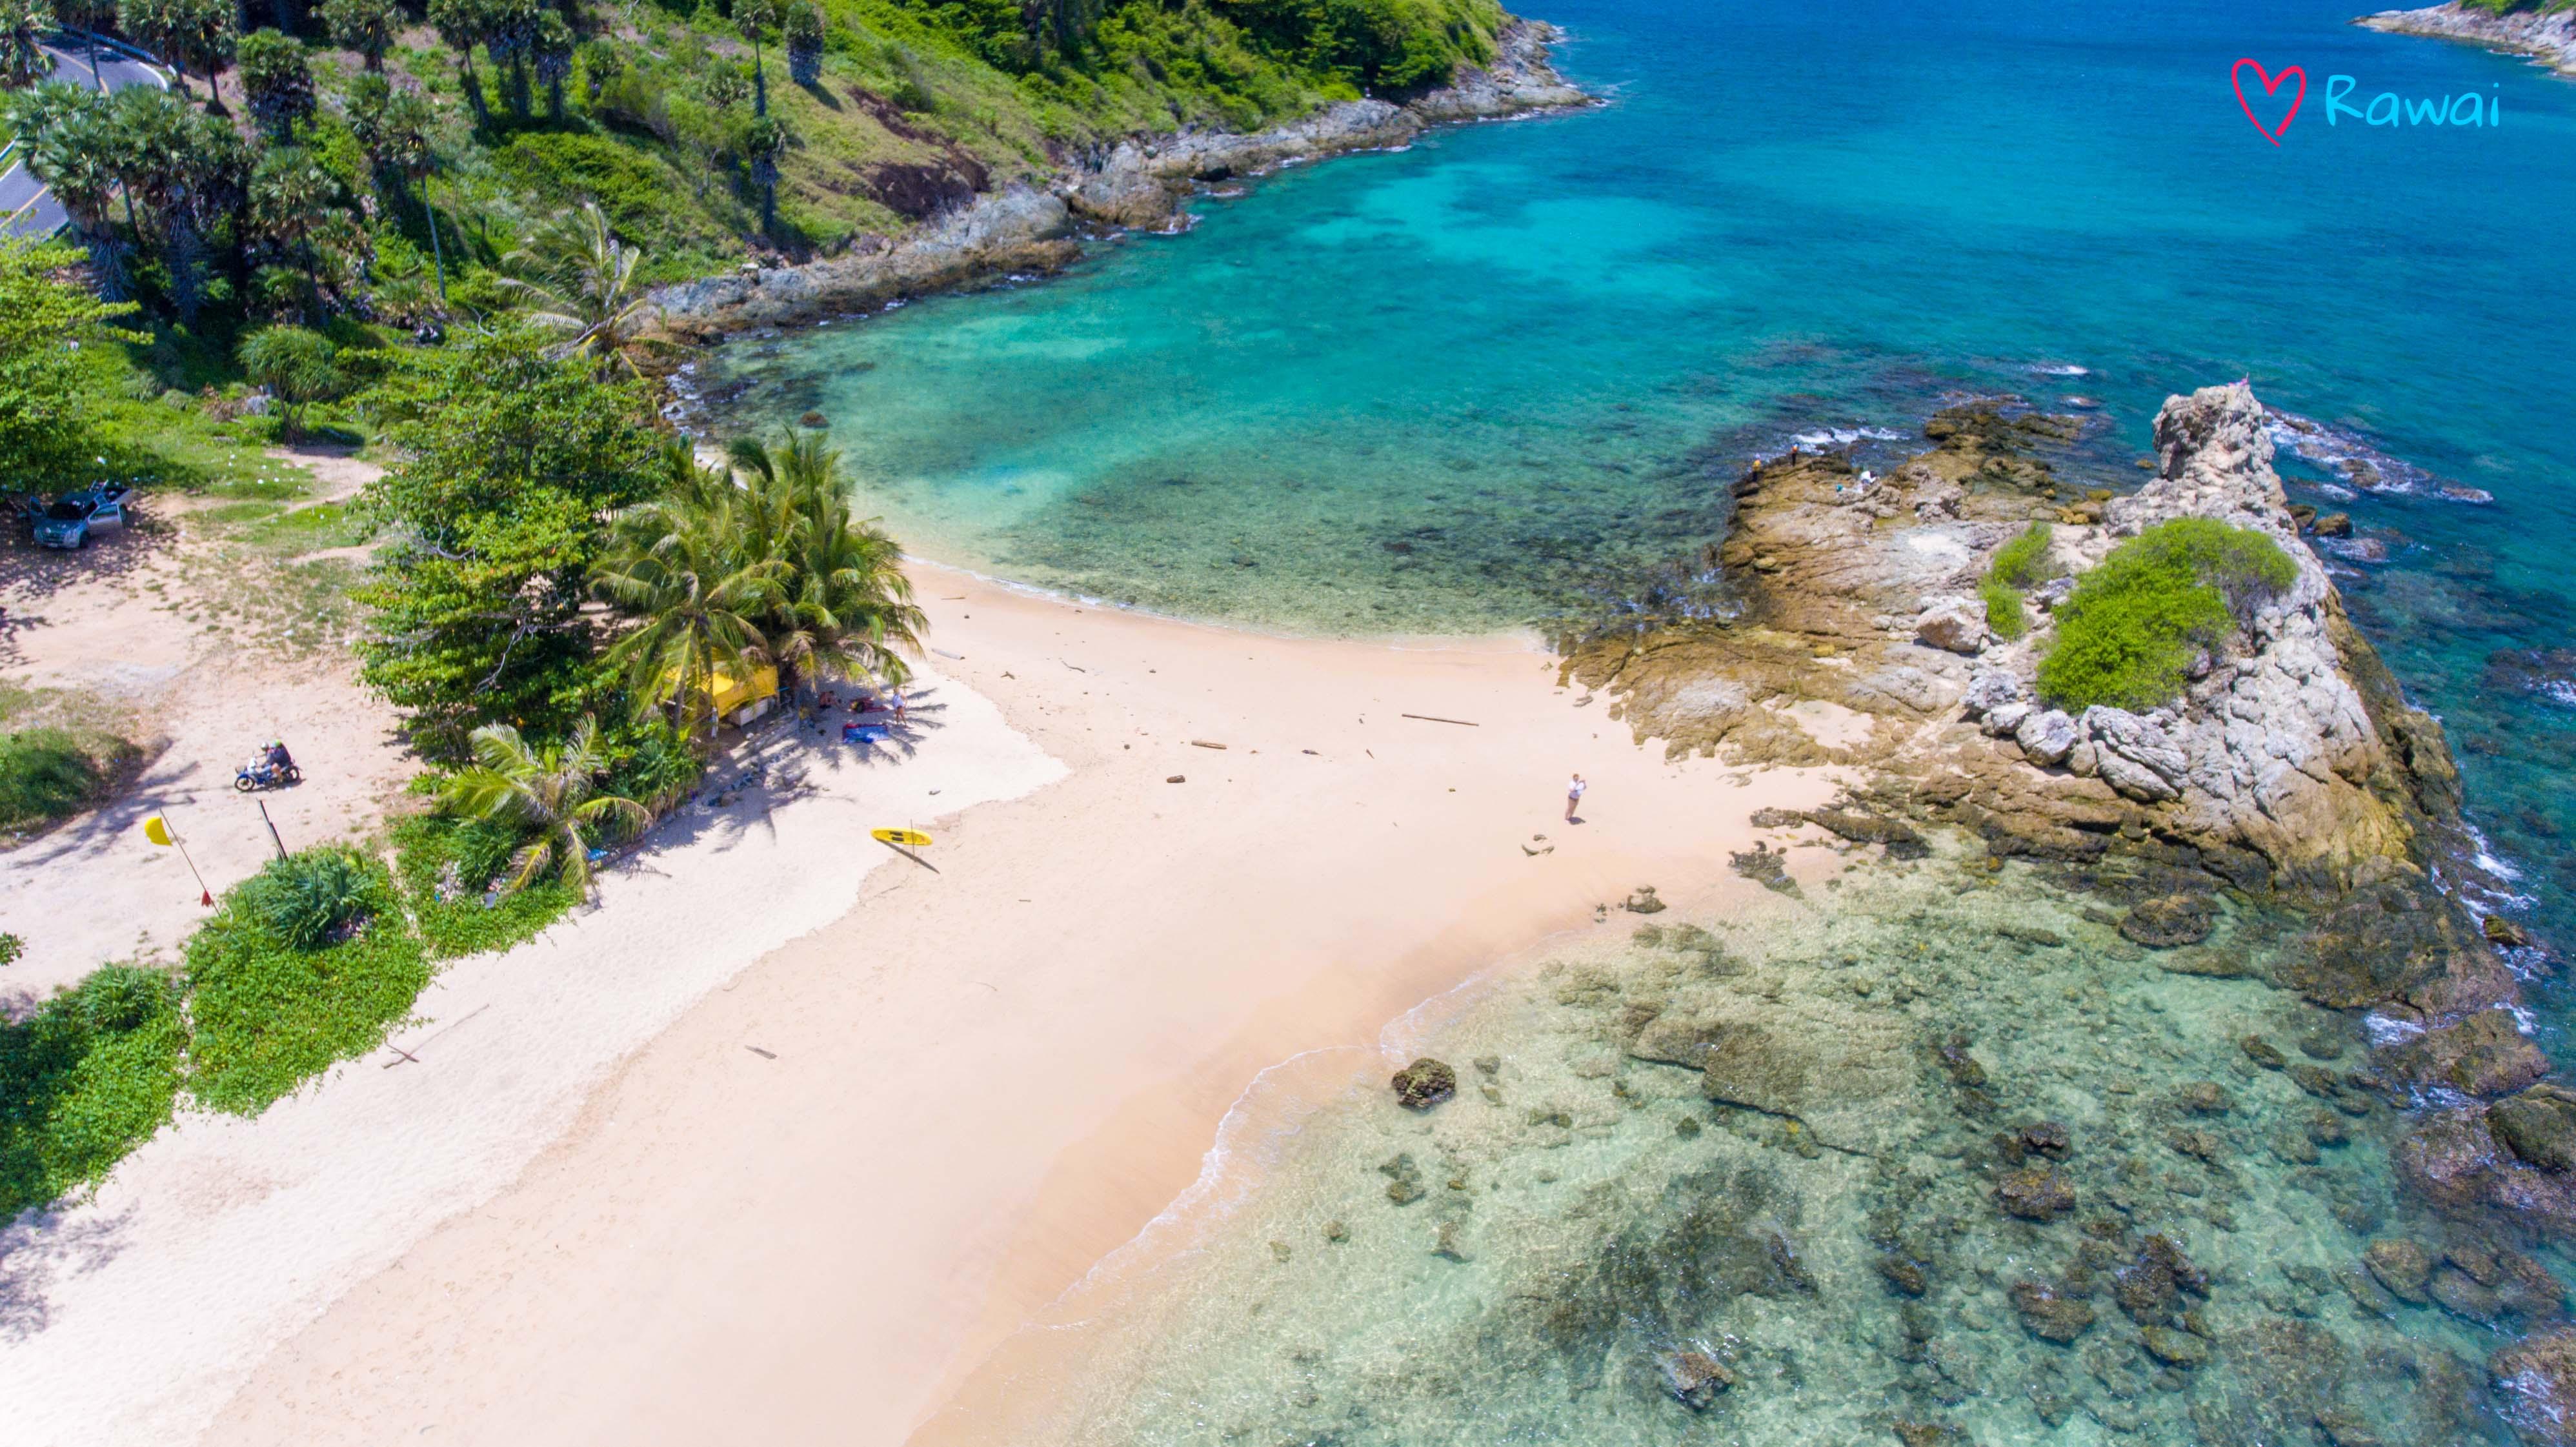 yanui beach rawai